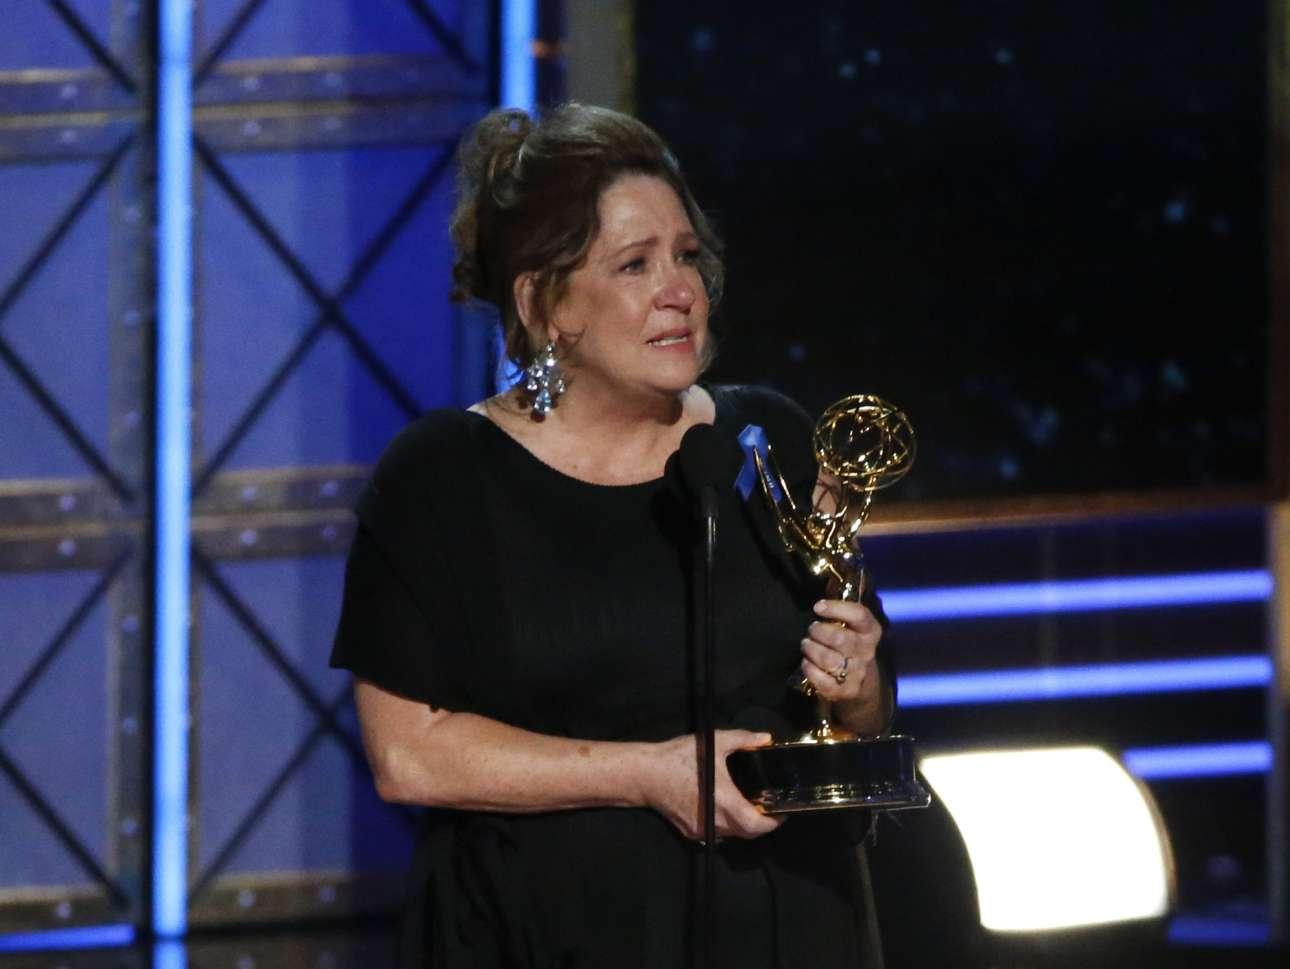 H Ανν Ντόουν δακρύζει καθώς παραλαμβάνει το βραβείο για την συμμετοχή της στην δραματική σειρά «The Handmaid's Tale»